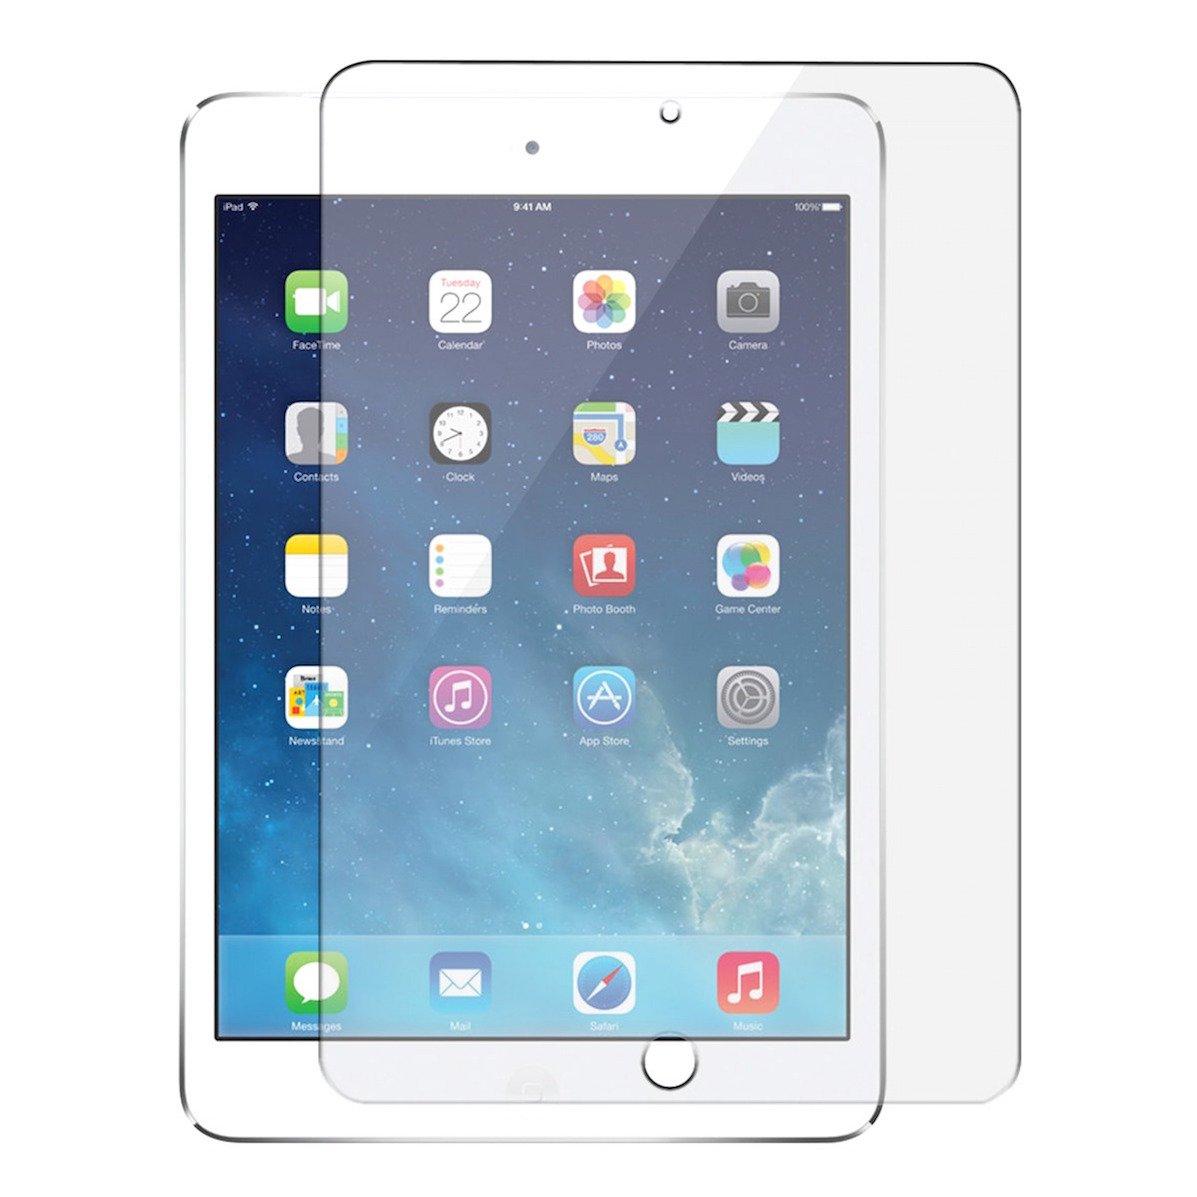 Targus Tempered Glass Screen Protector for iPad Mini 1/2/3 (AWV1285USZ)